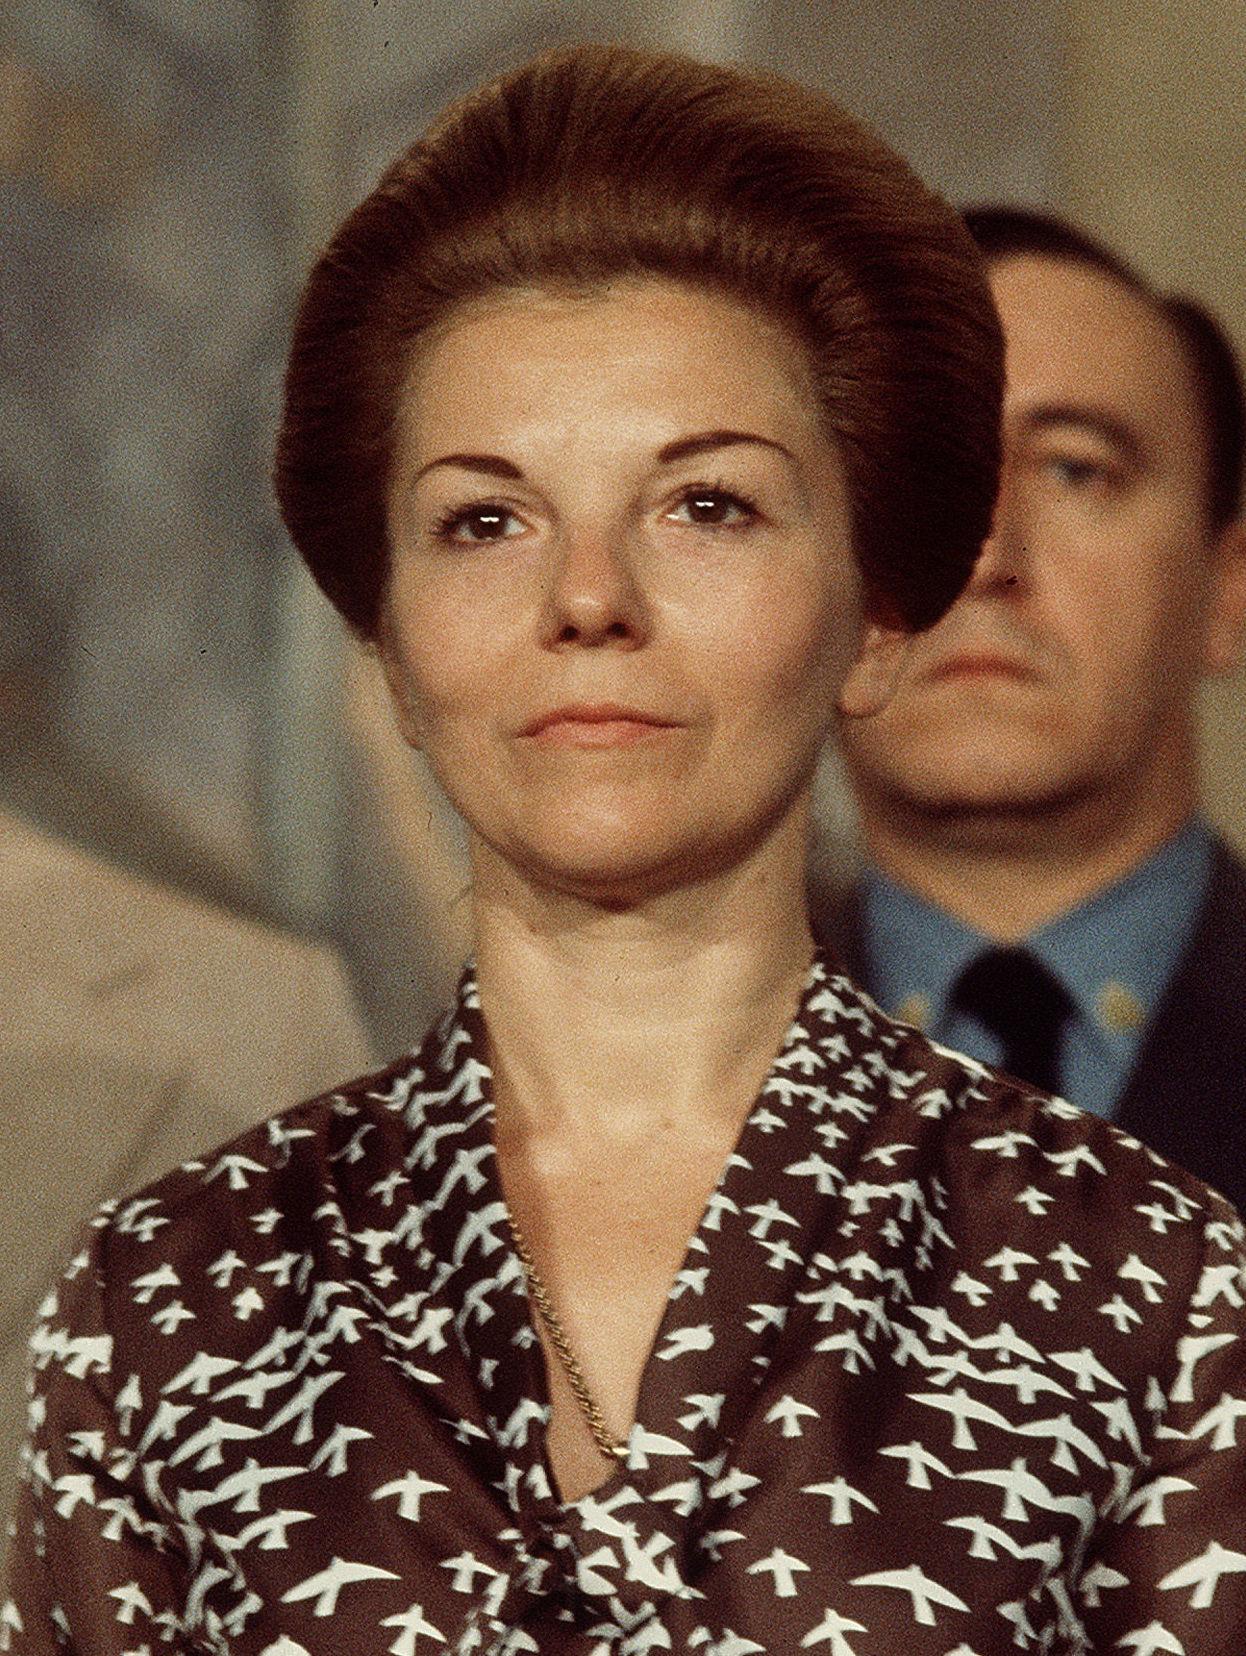 Бывший президент Аргентины Мария Эстела Мартинес де Перон